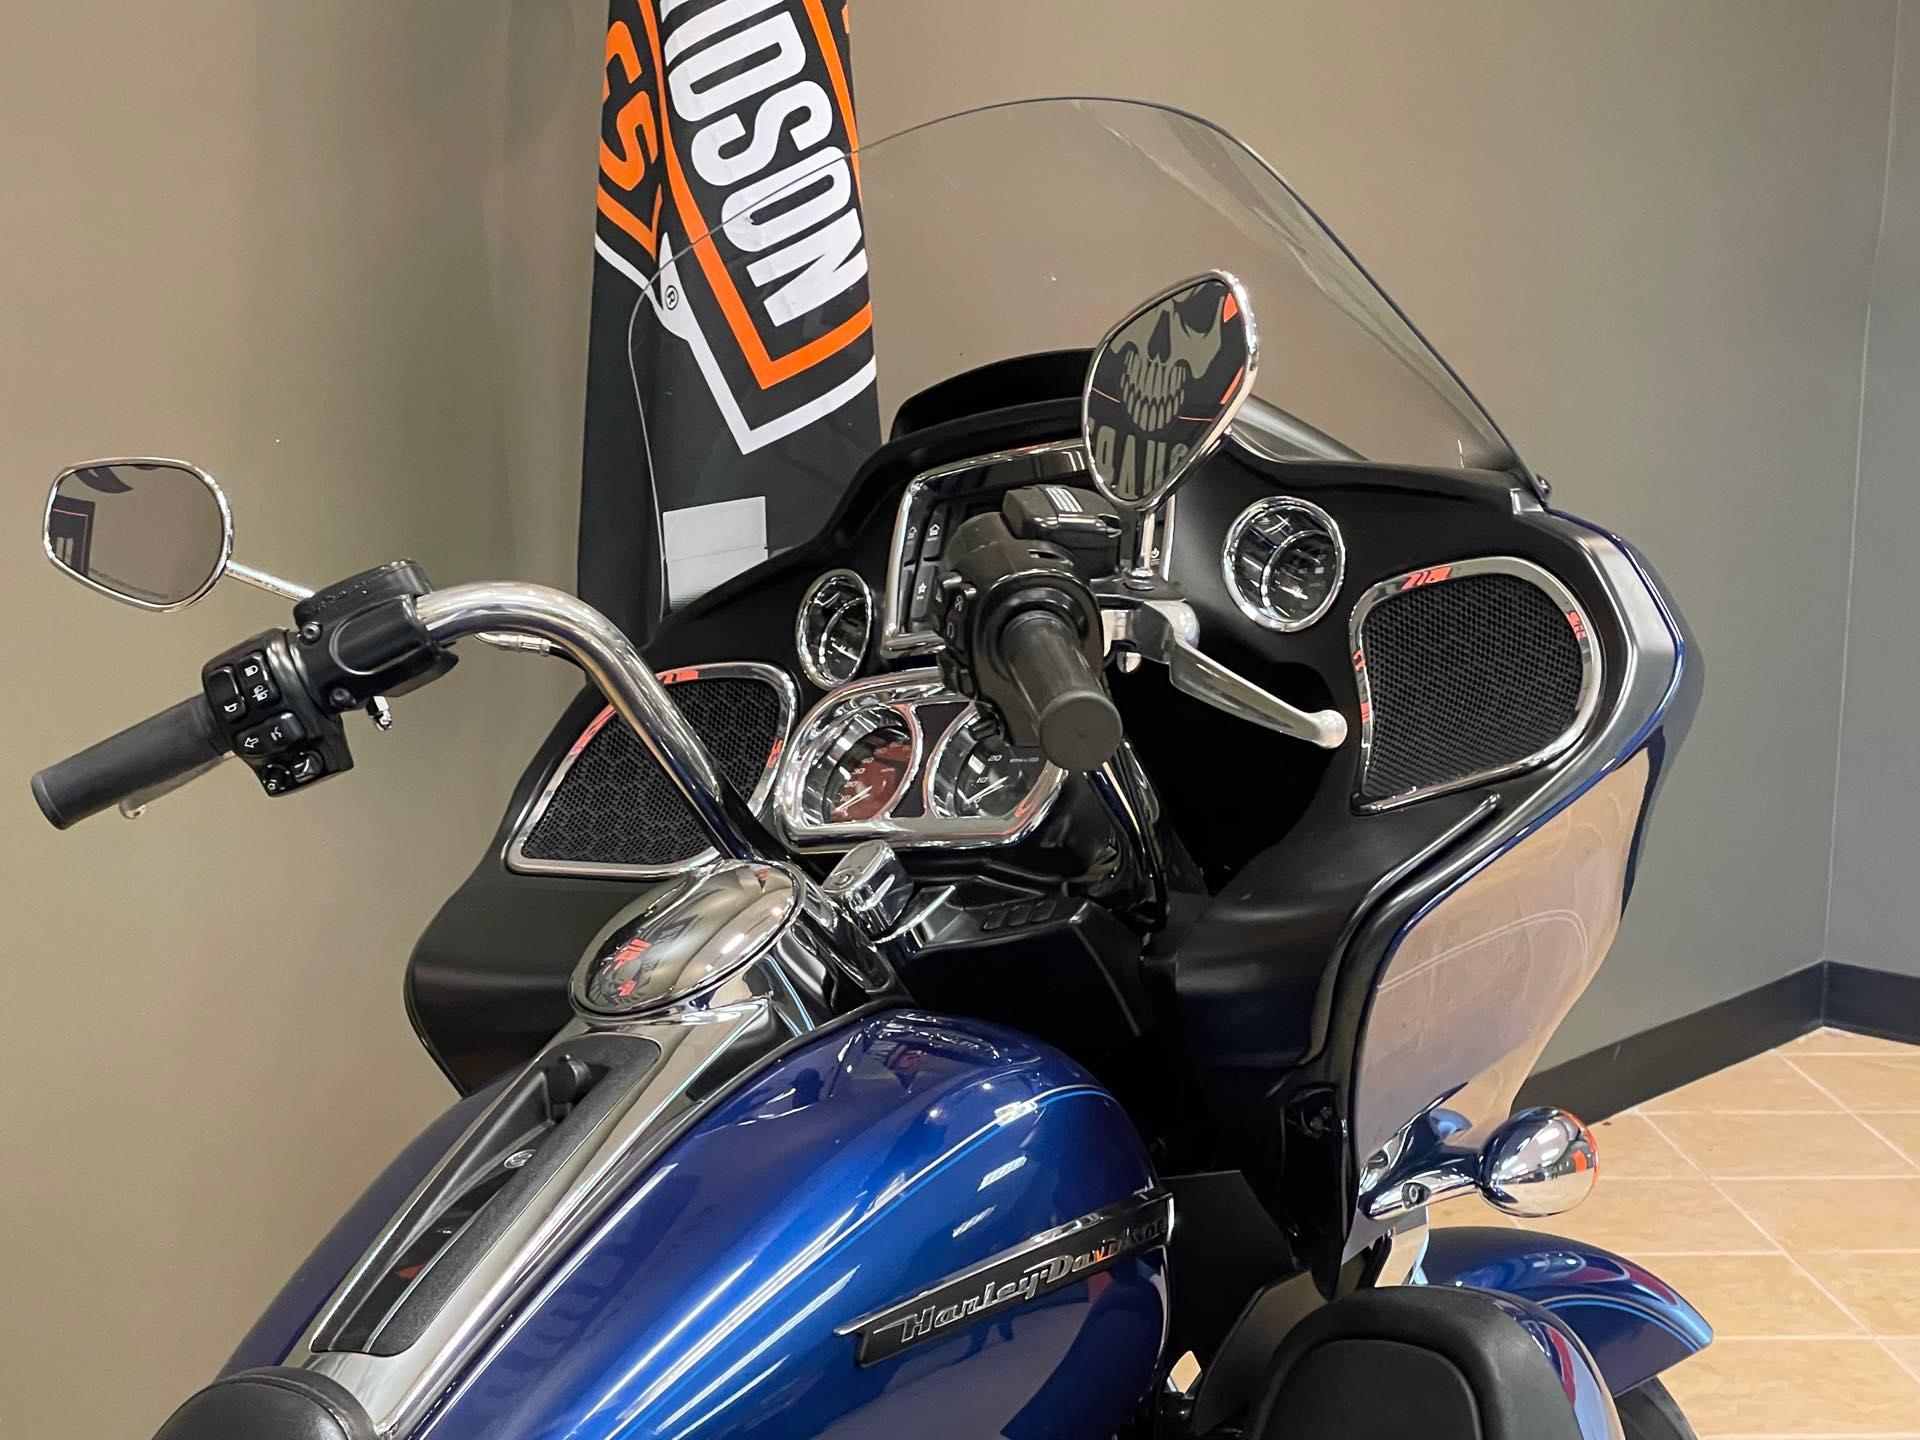 2016 Harley-Davidson Road Glide Ultra at Loess Hills Harley-Davidson